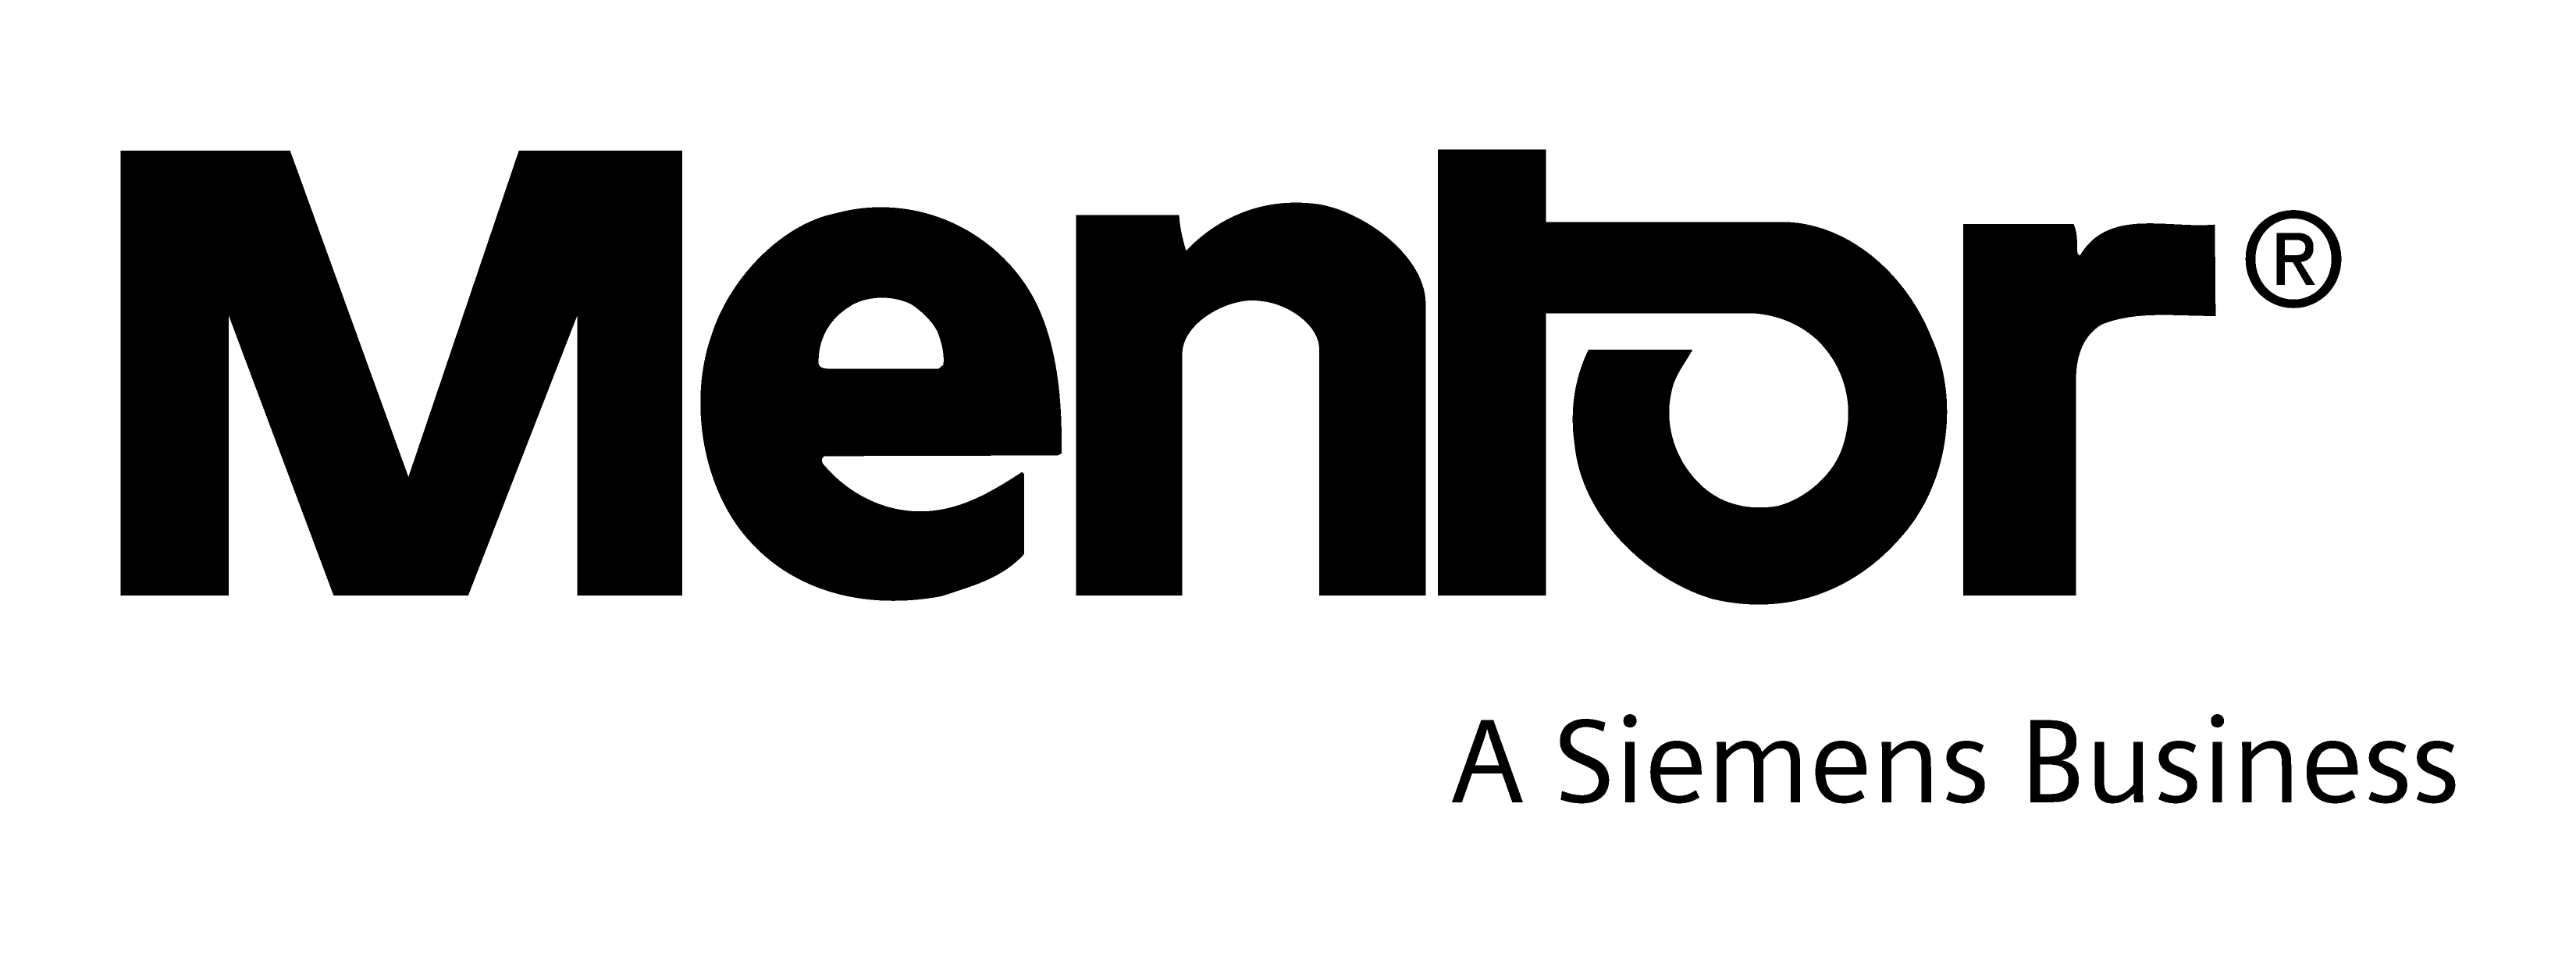 Mentor_Graphics_Logo.jpg